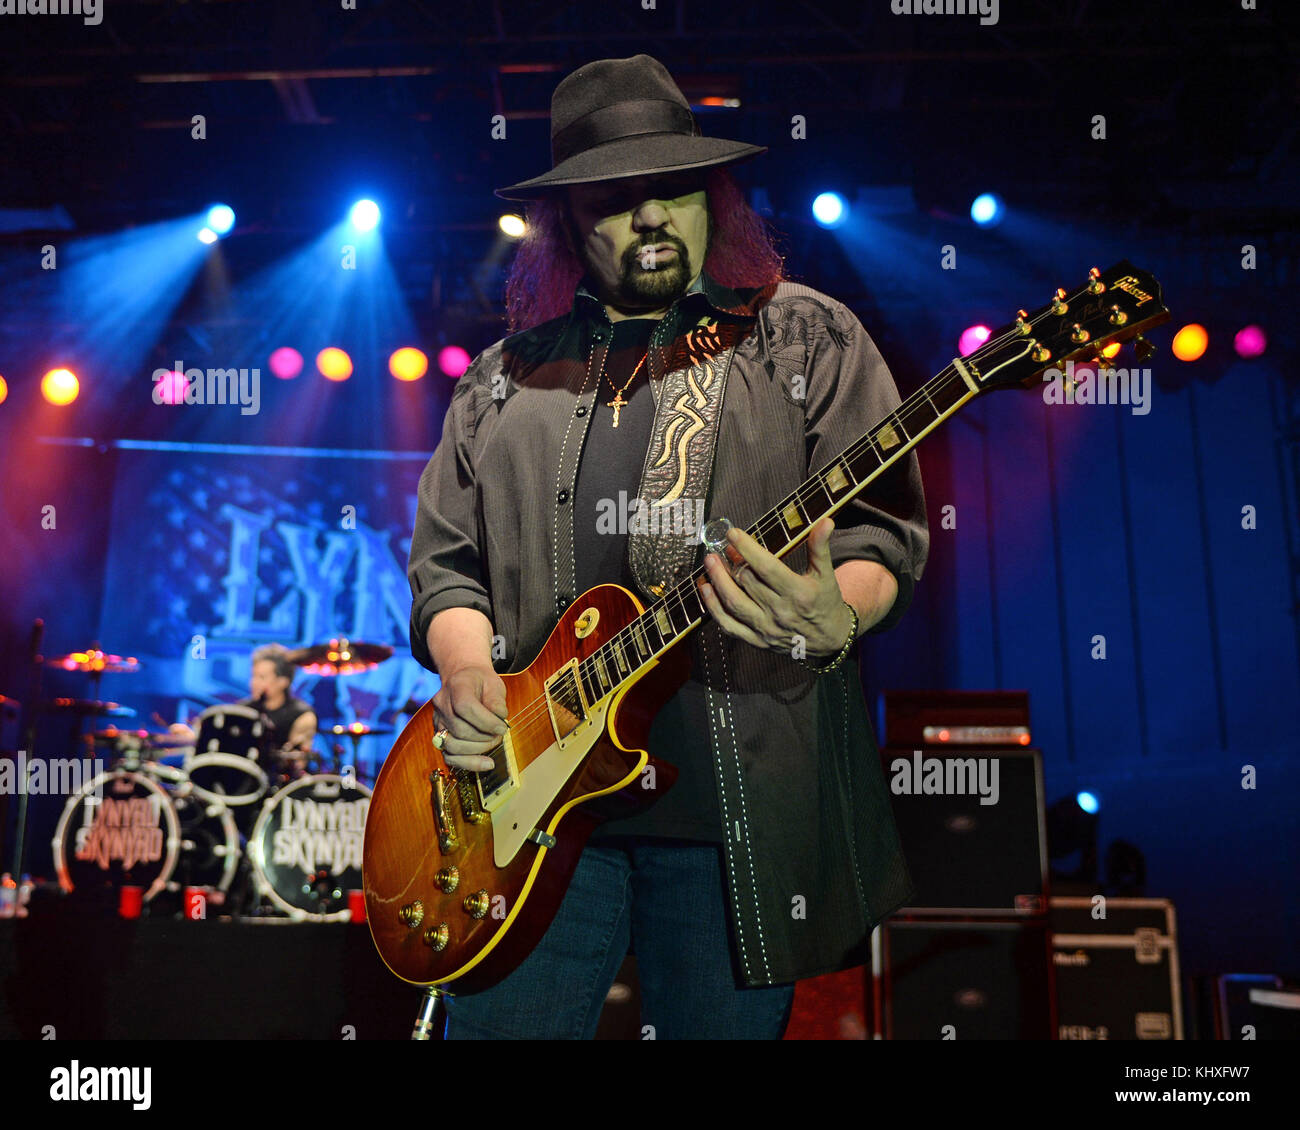 POMPANO BEACH FL - FEBRUARY 10: Gary Rossington of Lynyrd Skynyrd performs at The Pompano Beach Amphitheater on Stock Photo